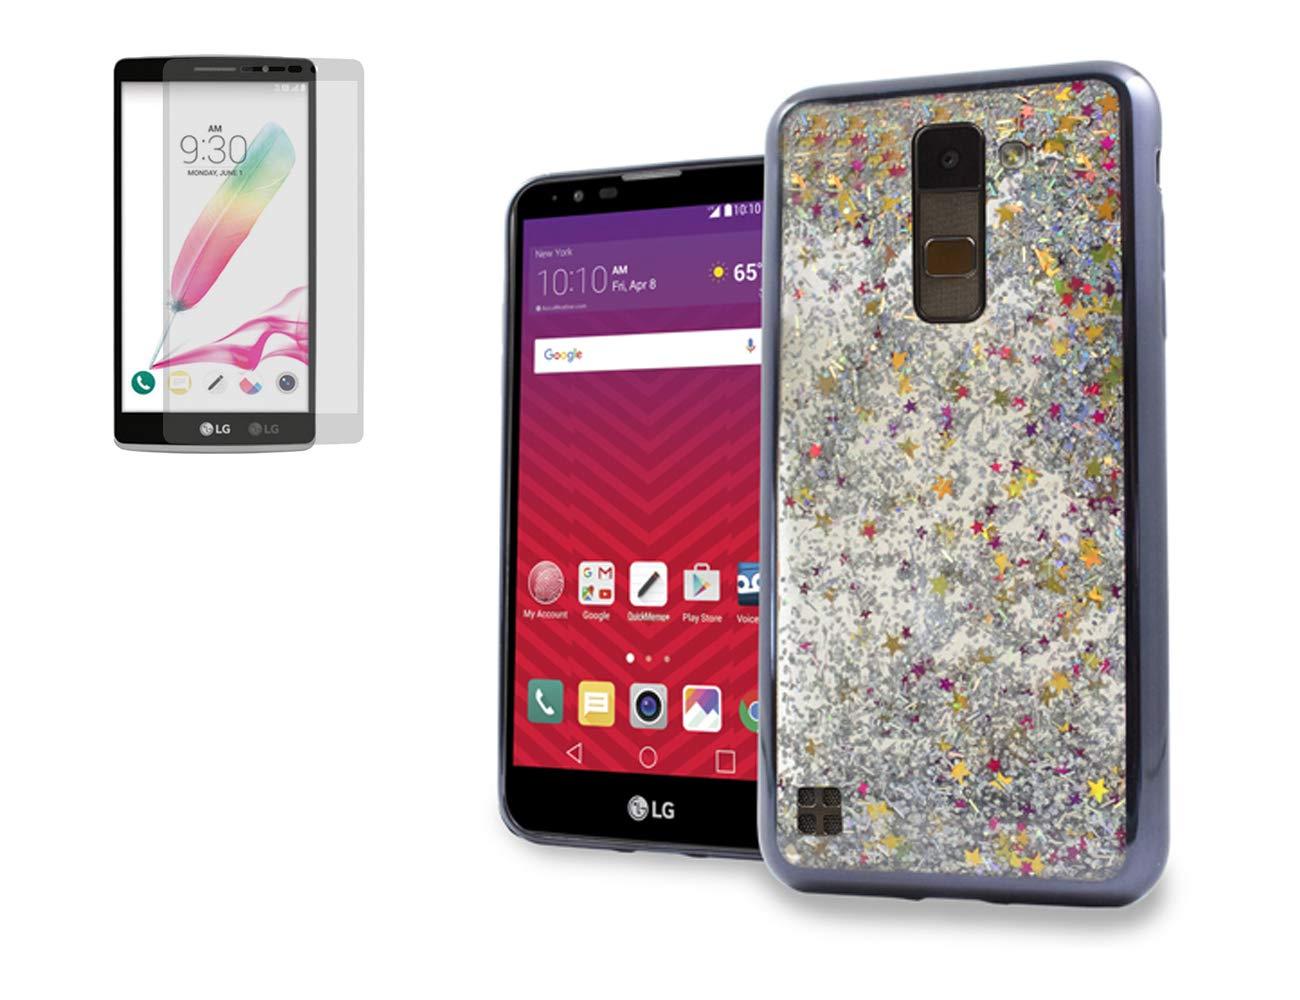 Tempered Glass+Waterfall Motion Liquid Quicksand Glitter Slip-Proof Flexible Rubber Case Cover for LG Stylo 2 / Stylo 2 V XLTE/Stylus 2 Phone (Black)